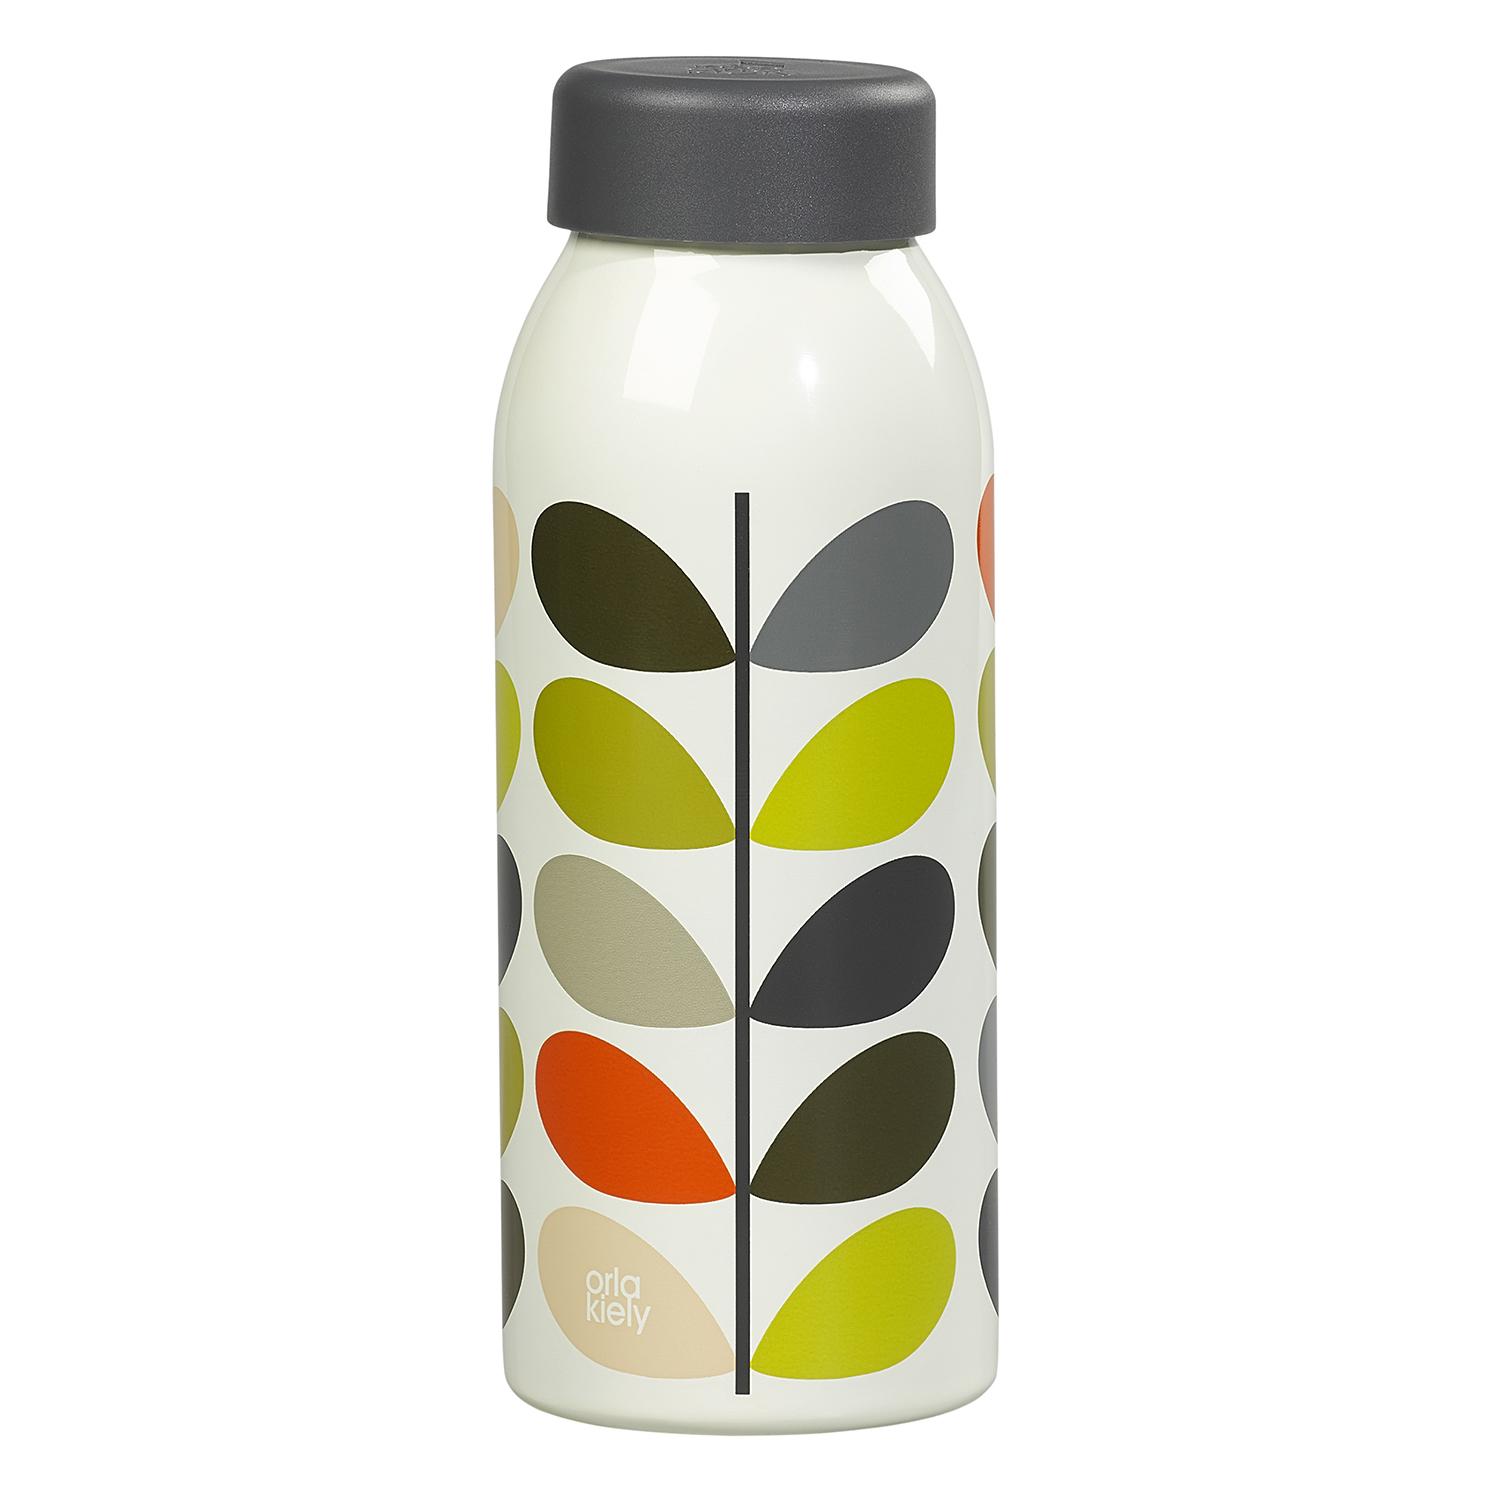 Orla Kiely – Multi Stem Print Stainless Steel Insulated Water Bottle